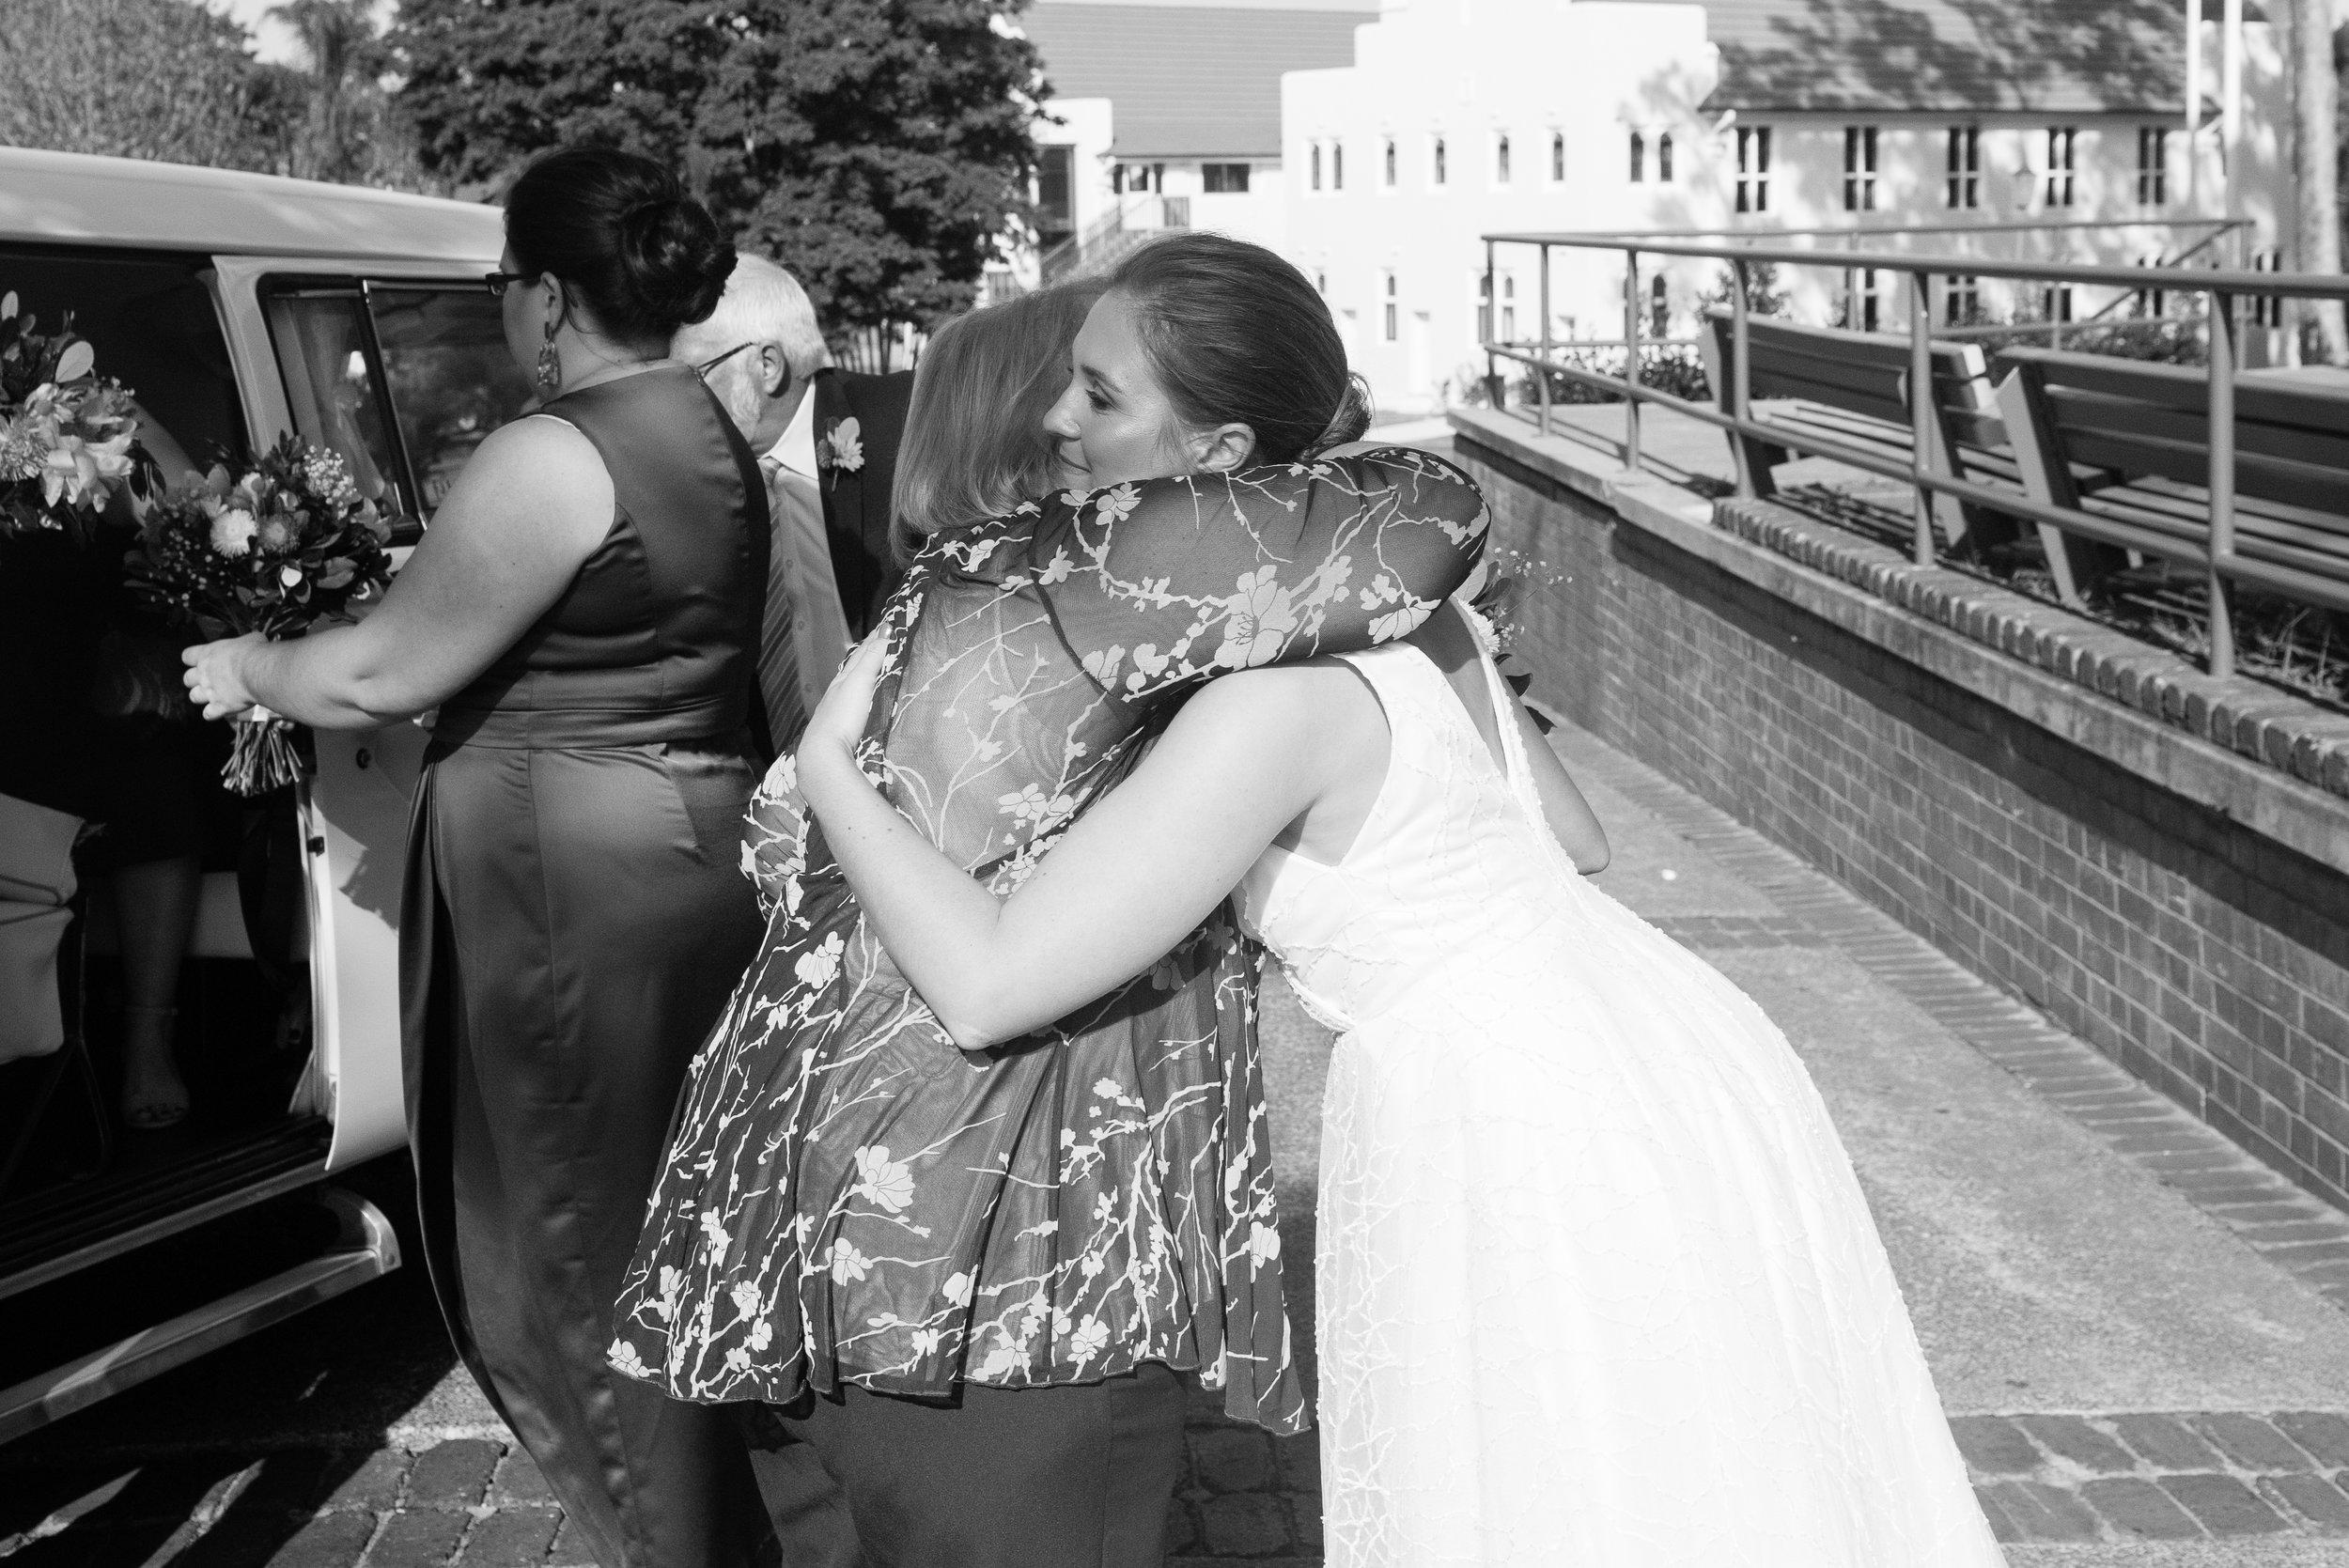 refinery-wedding-brisbane-city-wedding-photographer-33.jpg